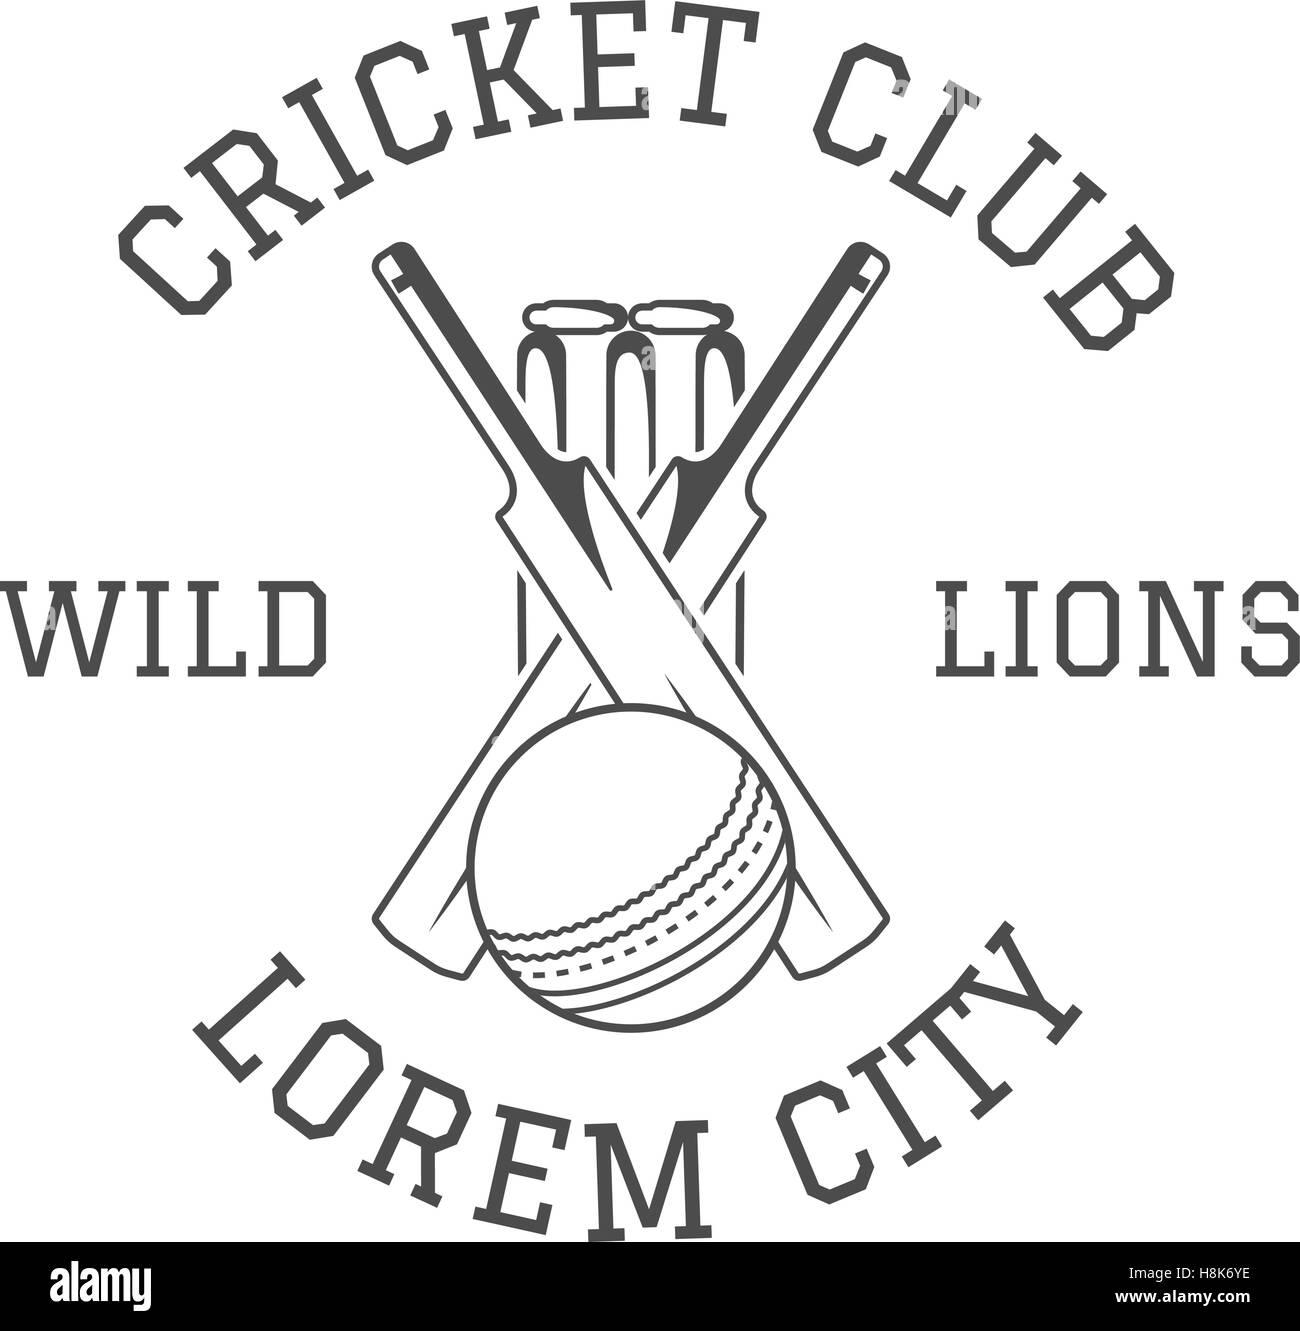 Cricket Club Emblem And Design Elements. Cricket Club Logo